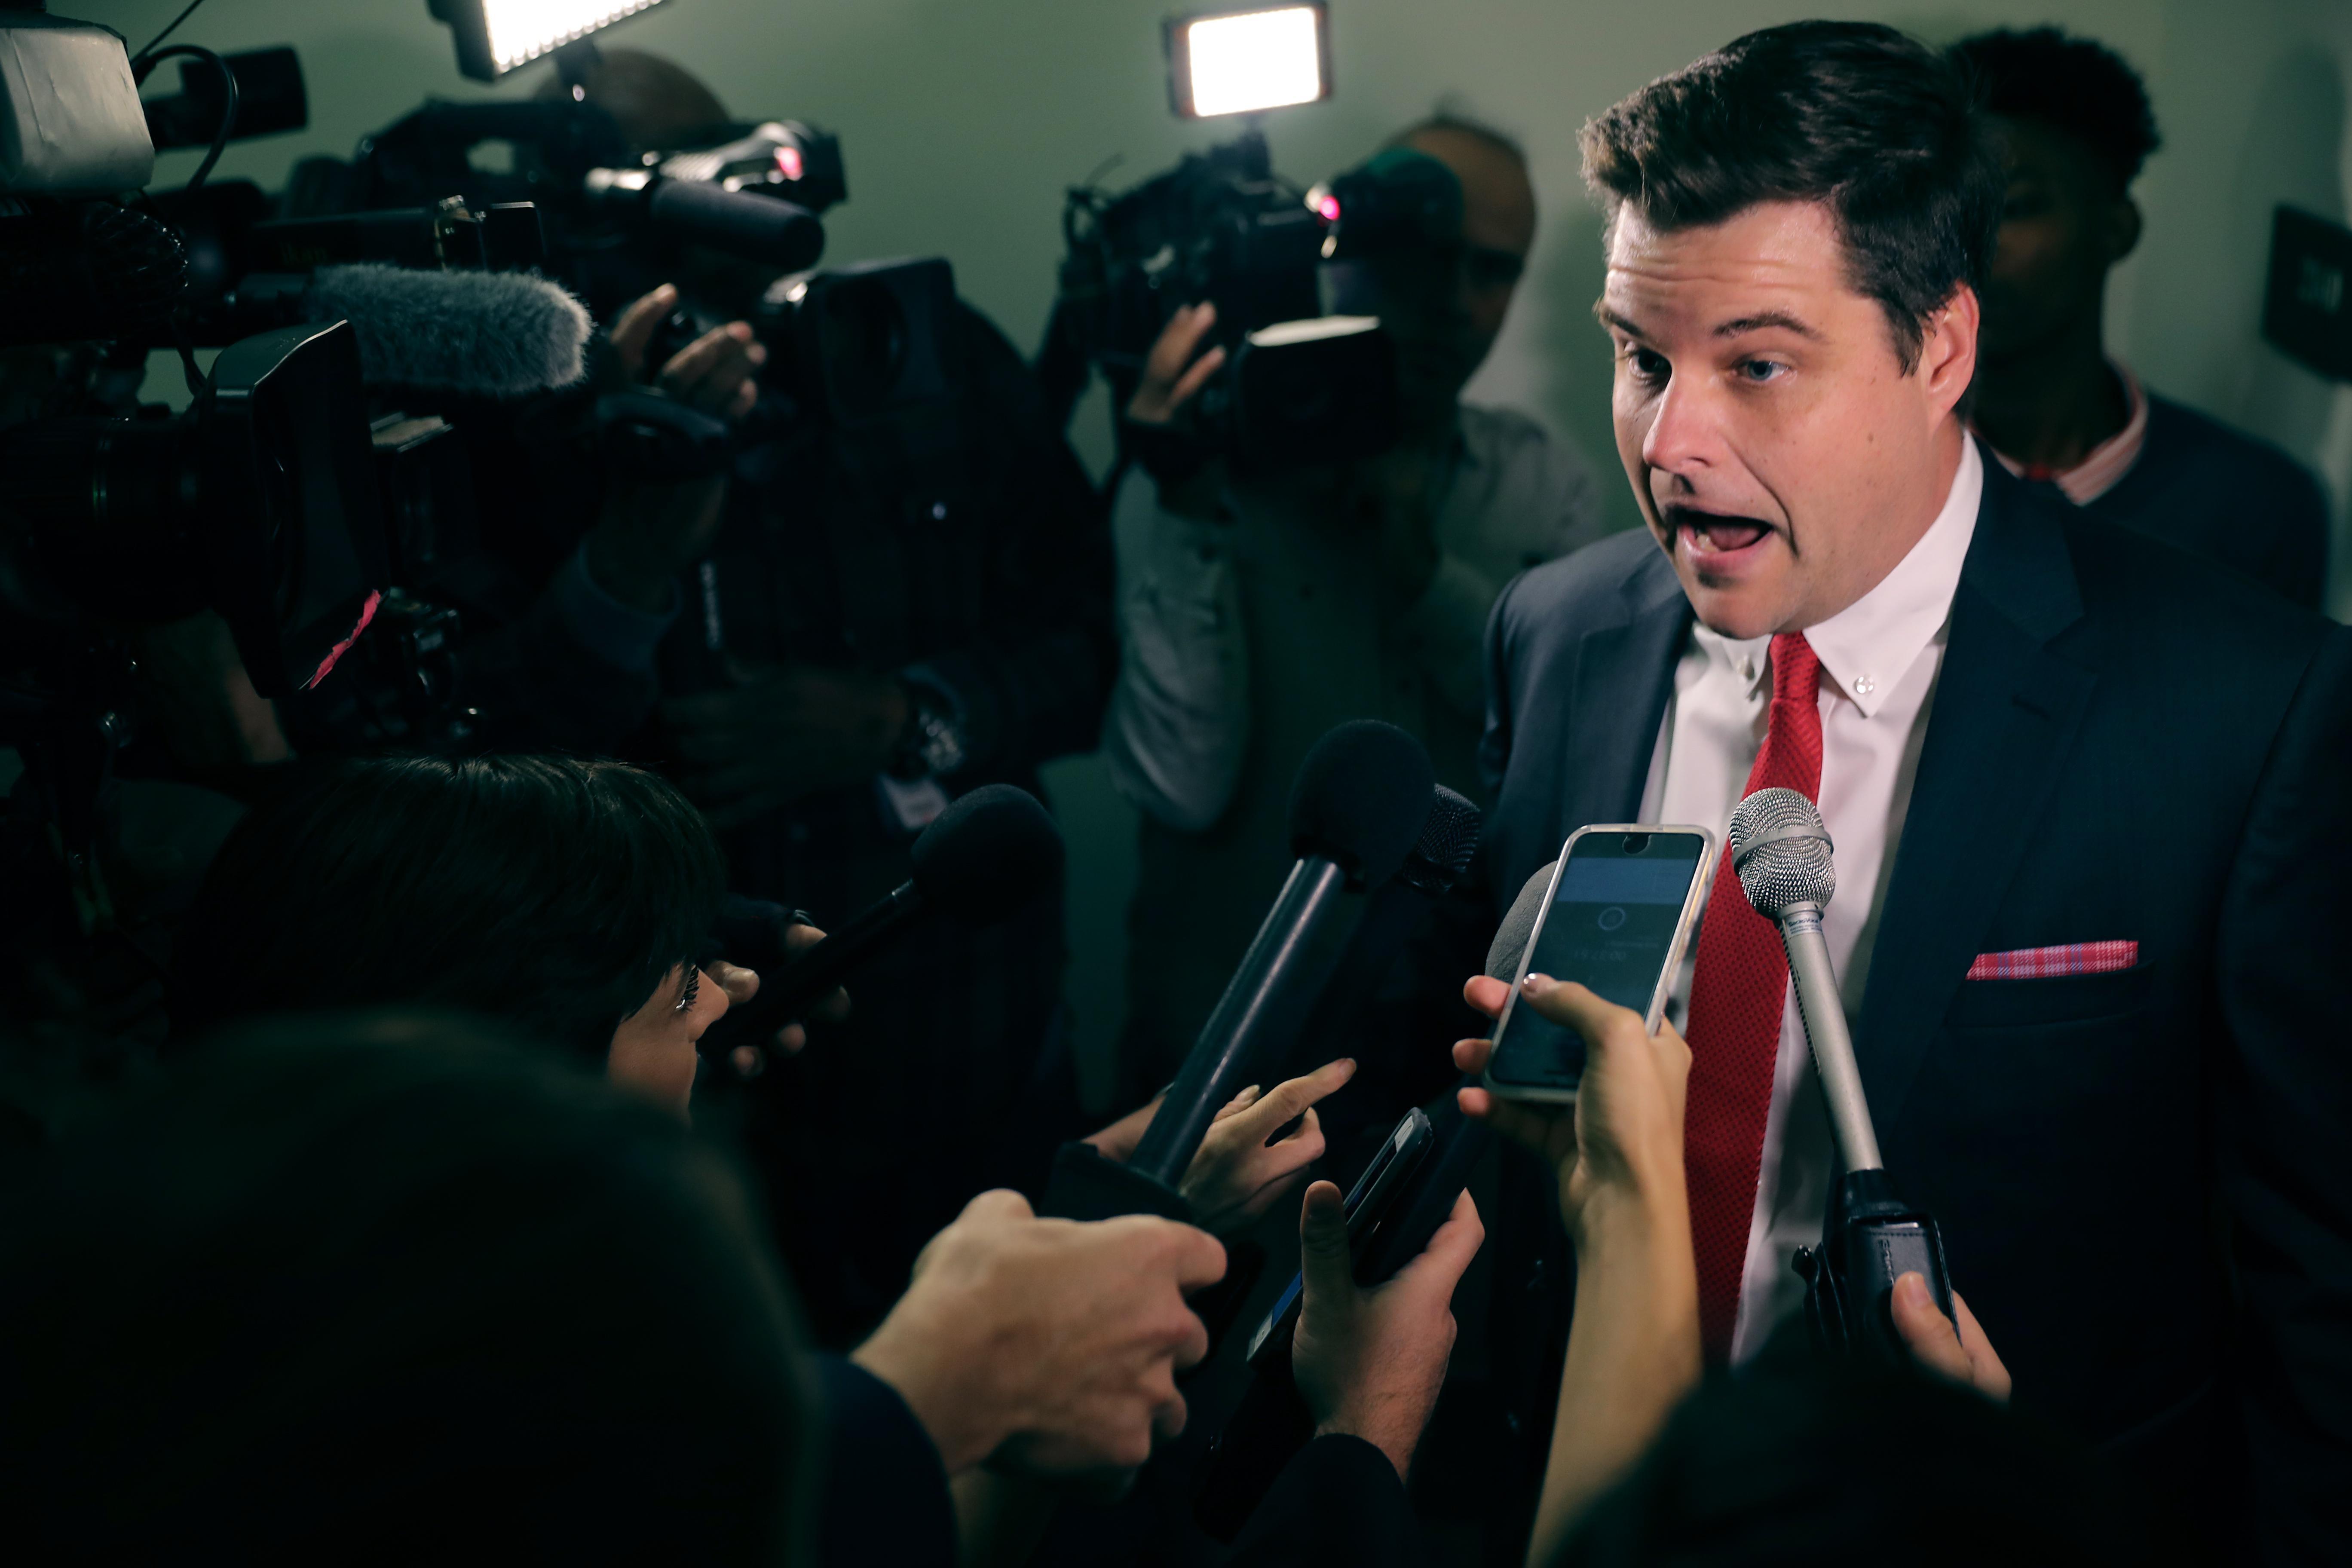 Matt Gaetz speaking to reporters, looking agitated.